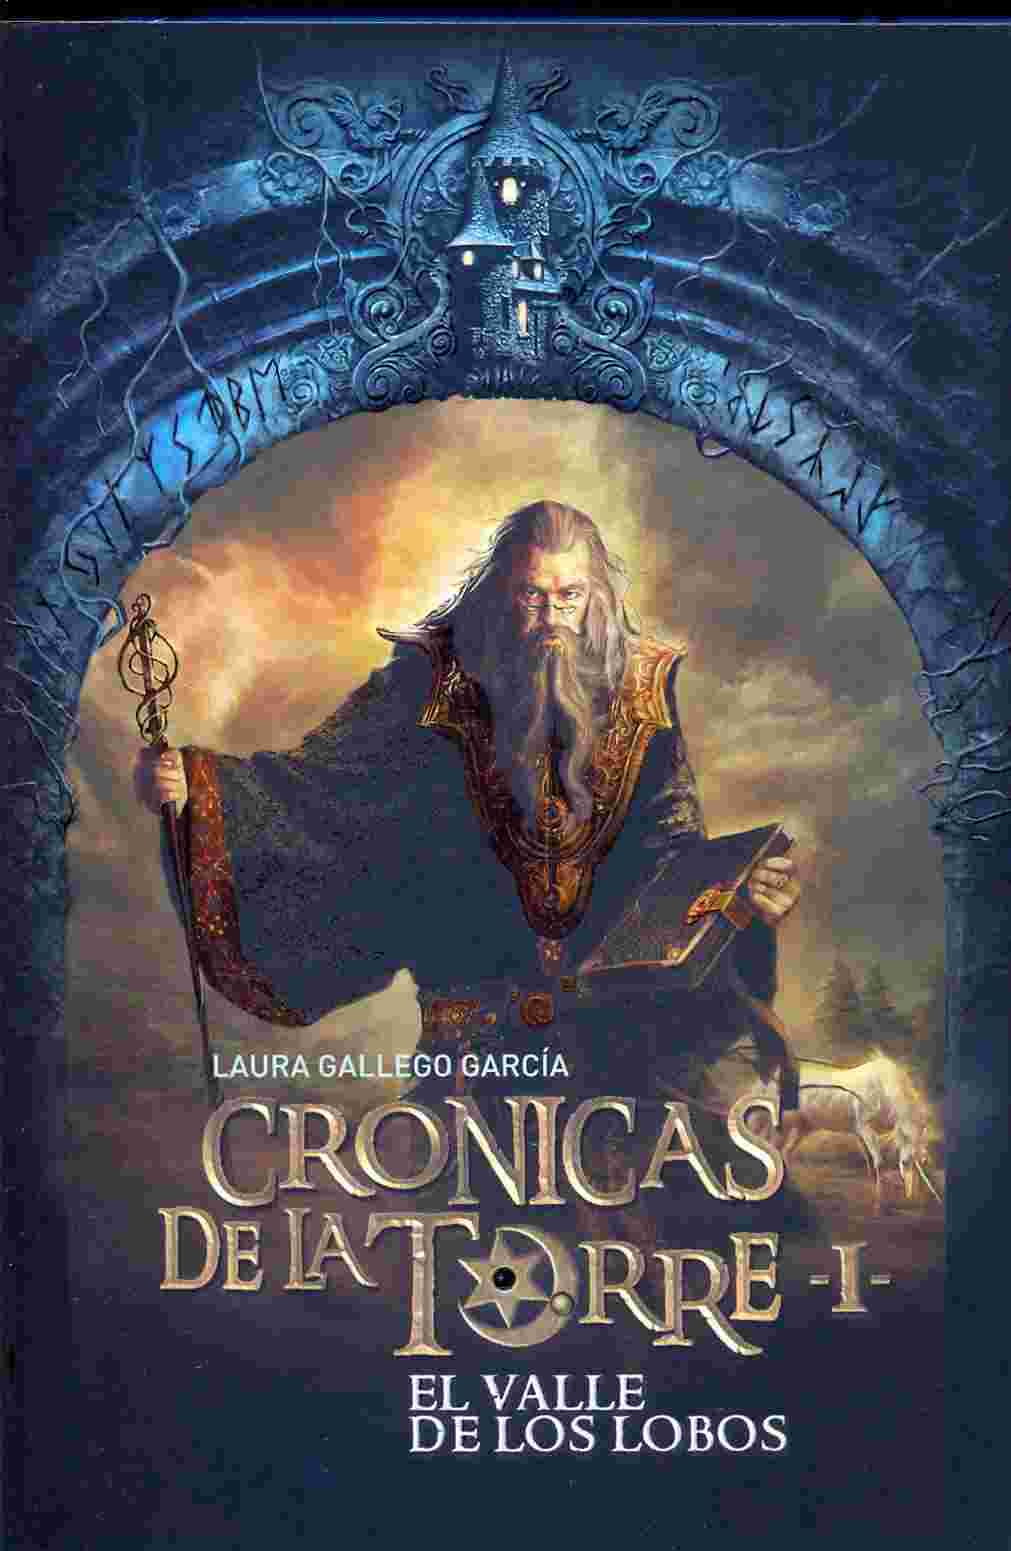 laura gallego garca: